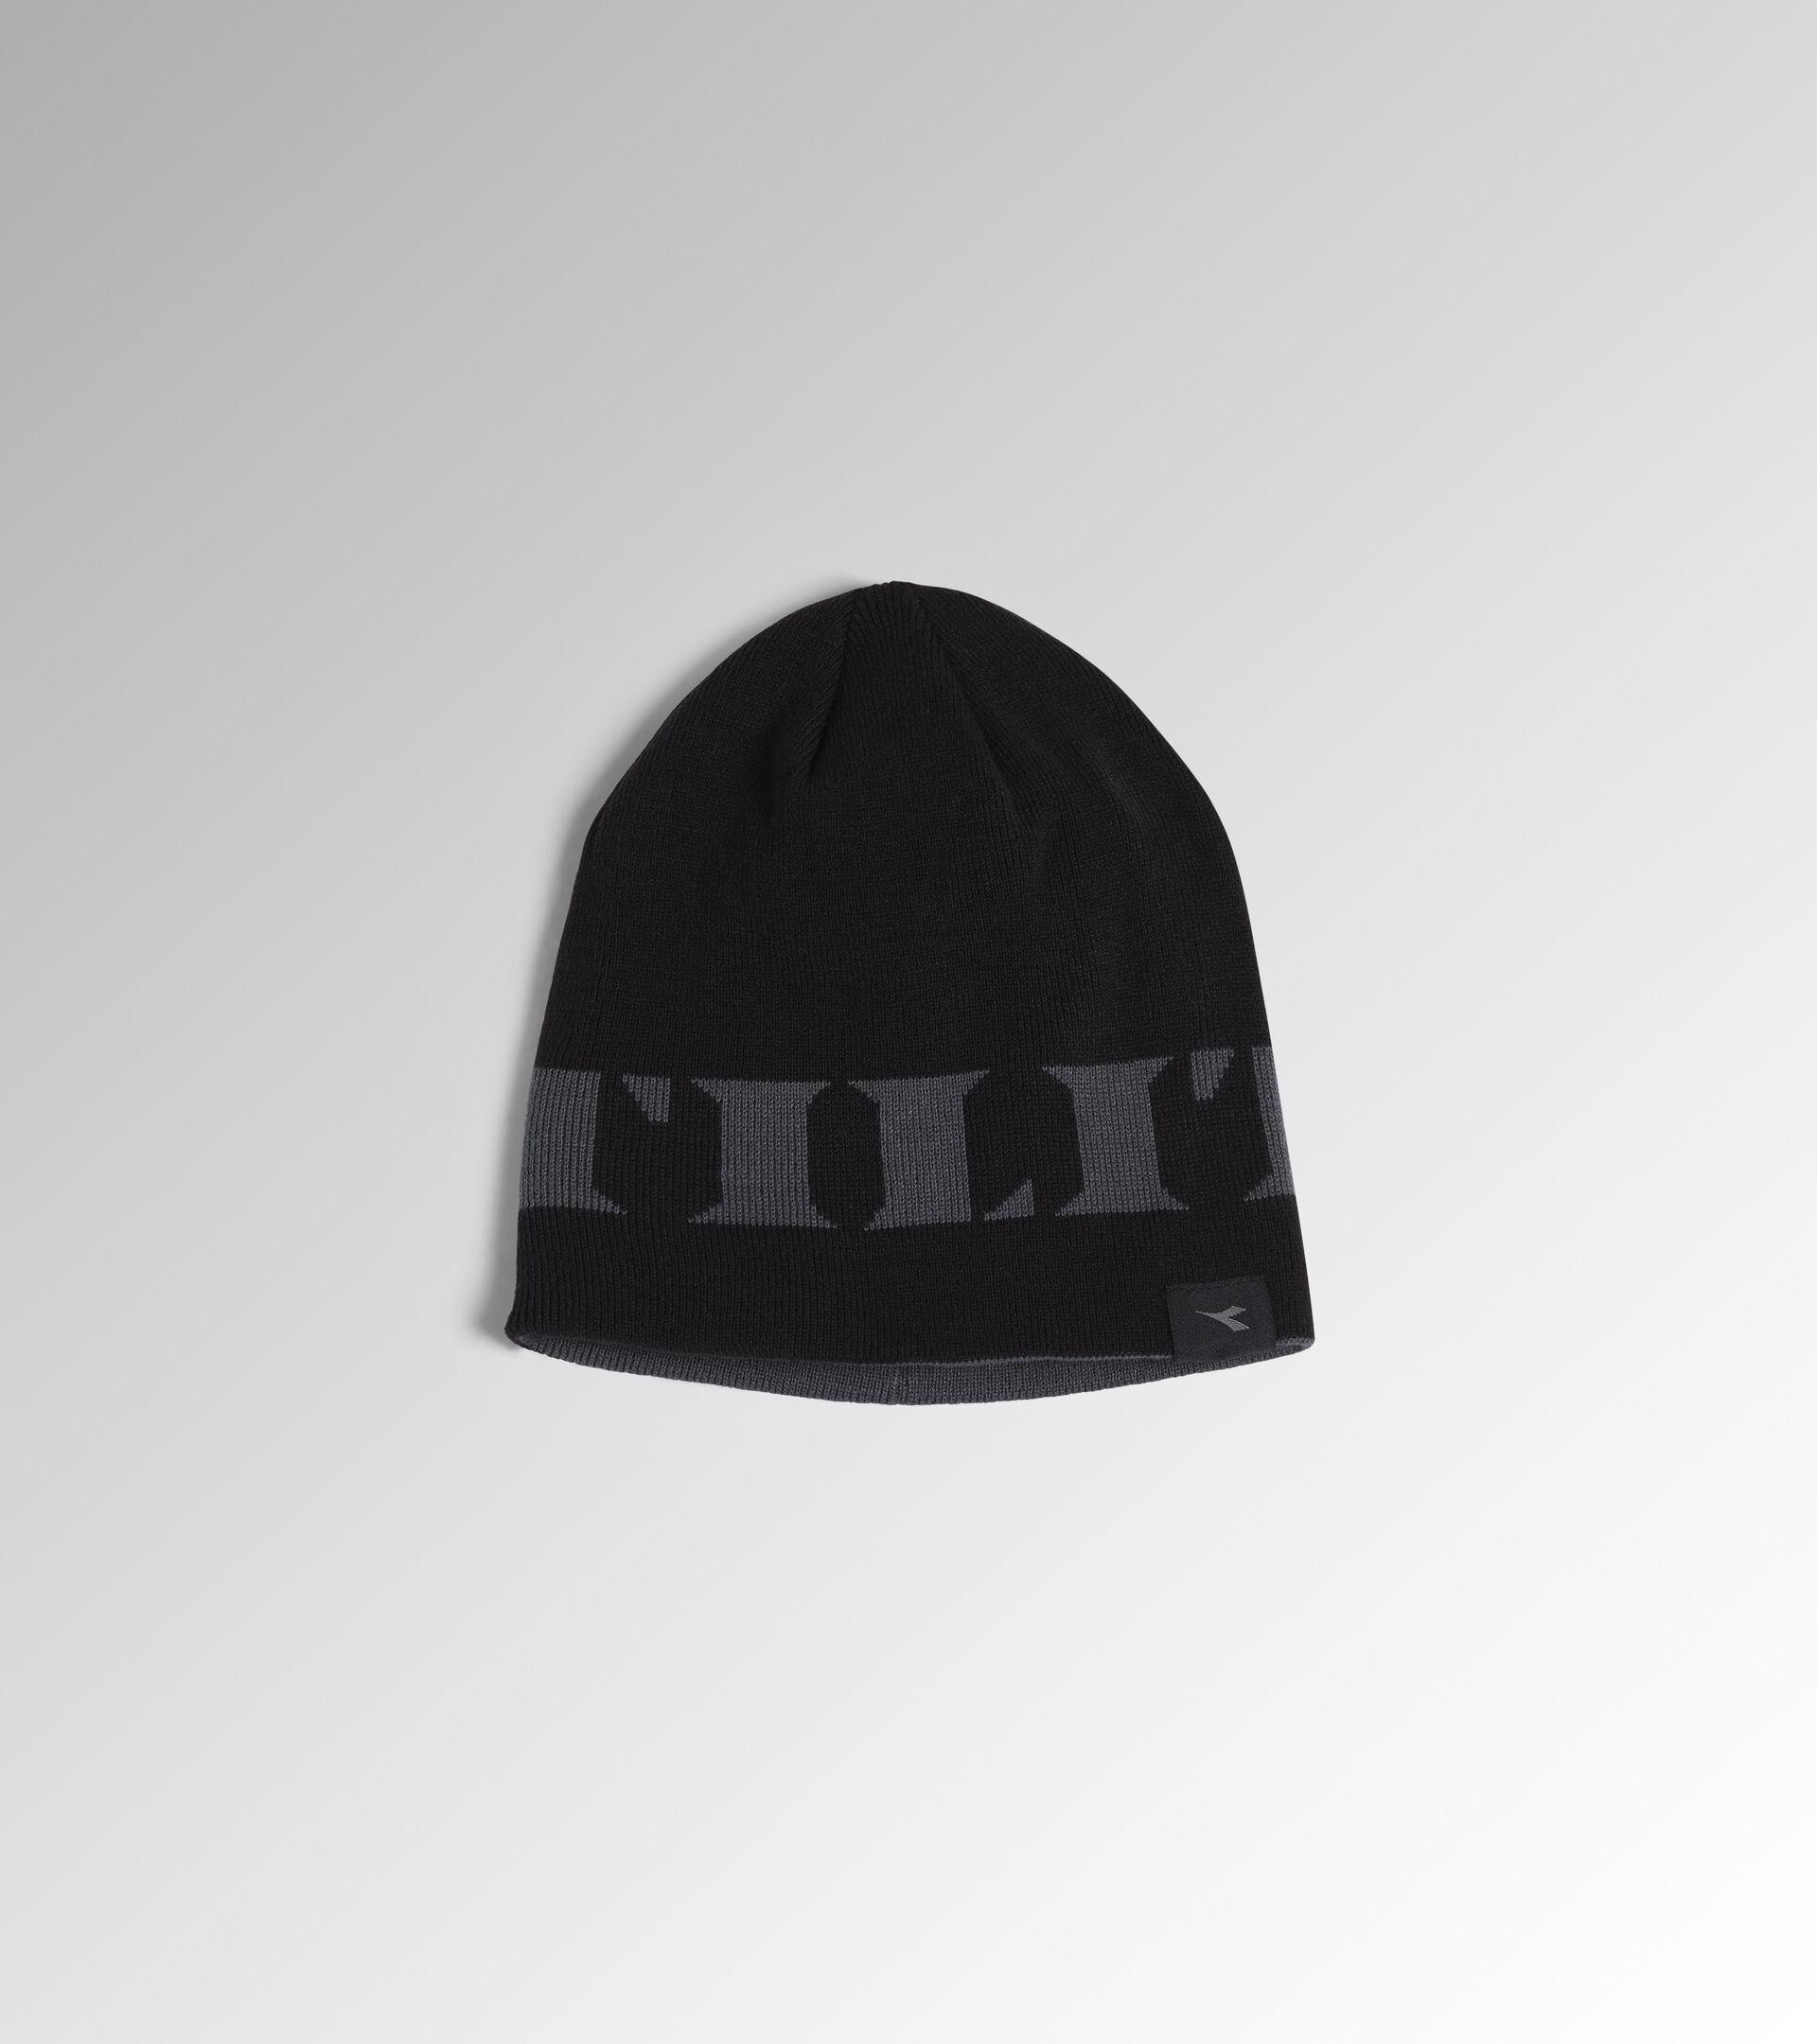 Accessories Utility UNISEX WOOL CAP GRAPHIC BLACK Utility